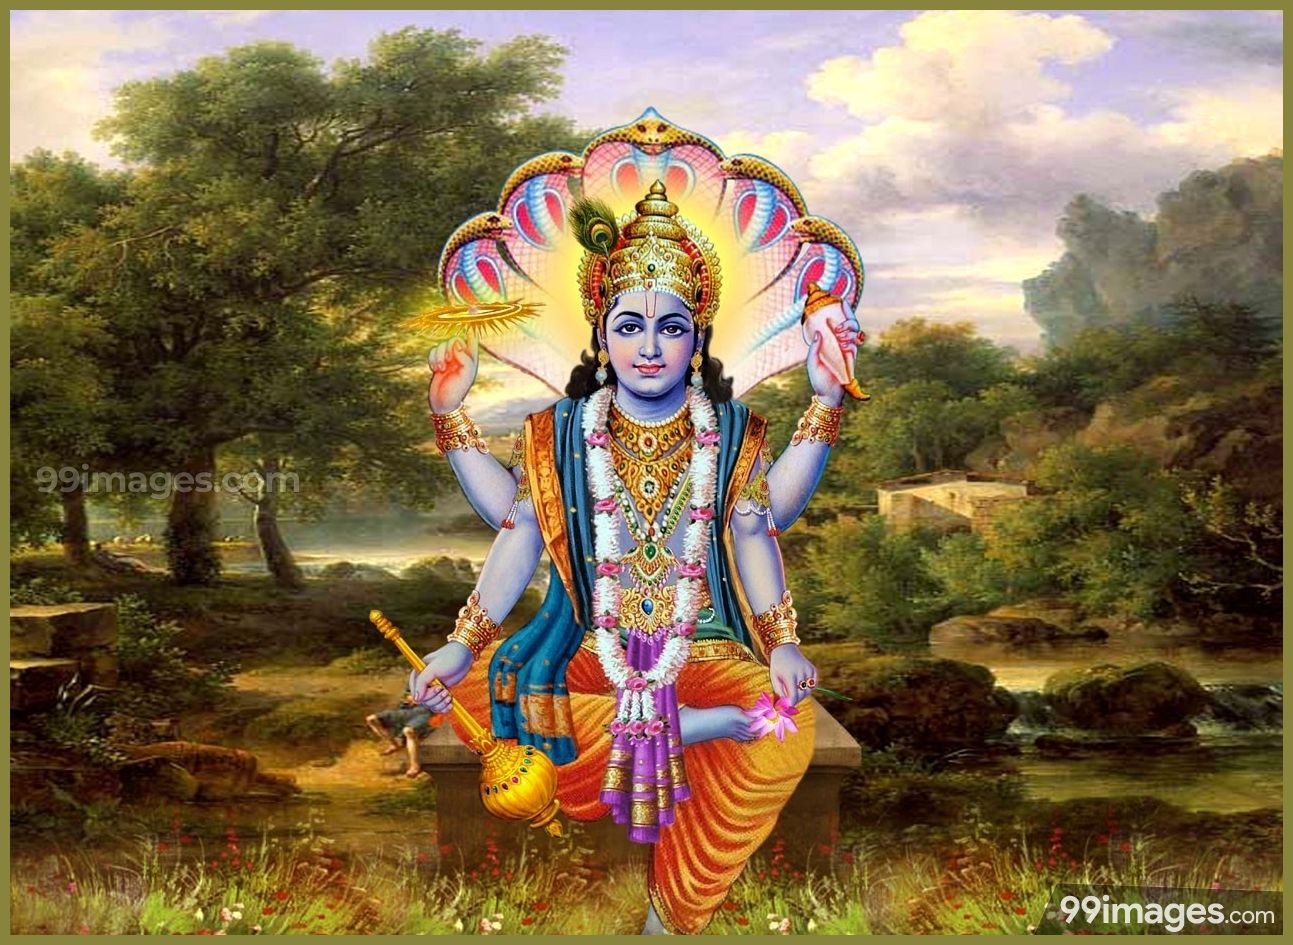 Lord Vishnu Hd Images 1080p 5302 Lordvishnu God Hindu Wallpapers Lord Vishnu Wallpapers Lord Krishna Images Lord Krishna Wallpapers